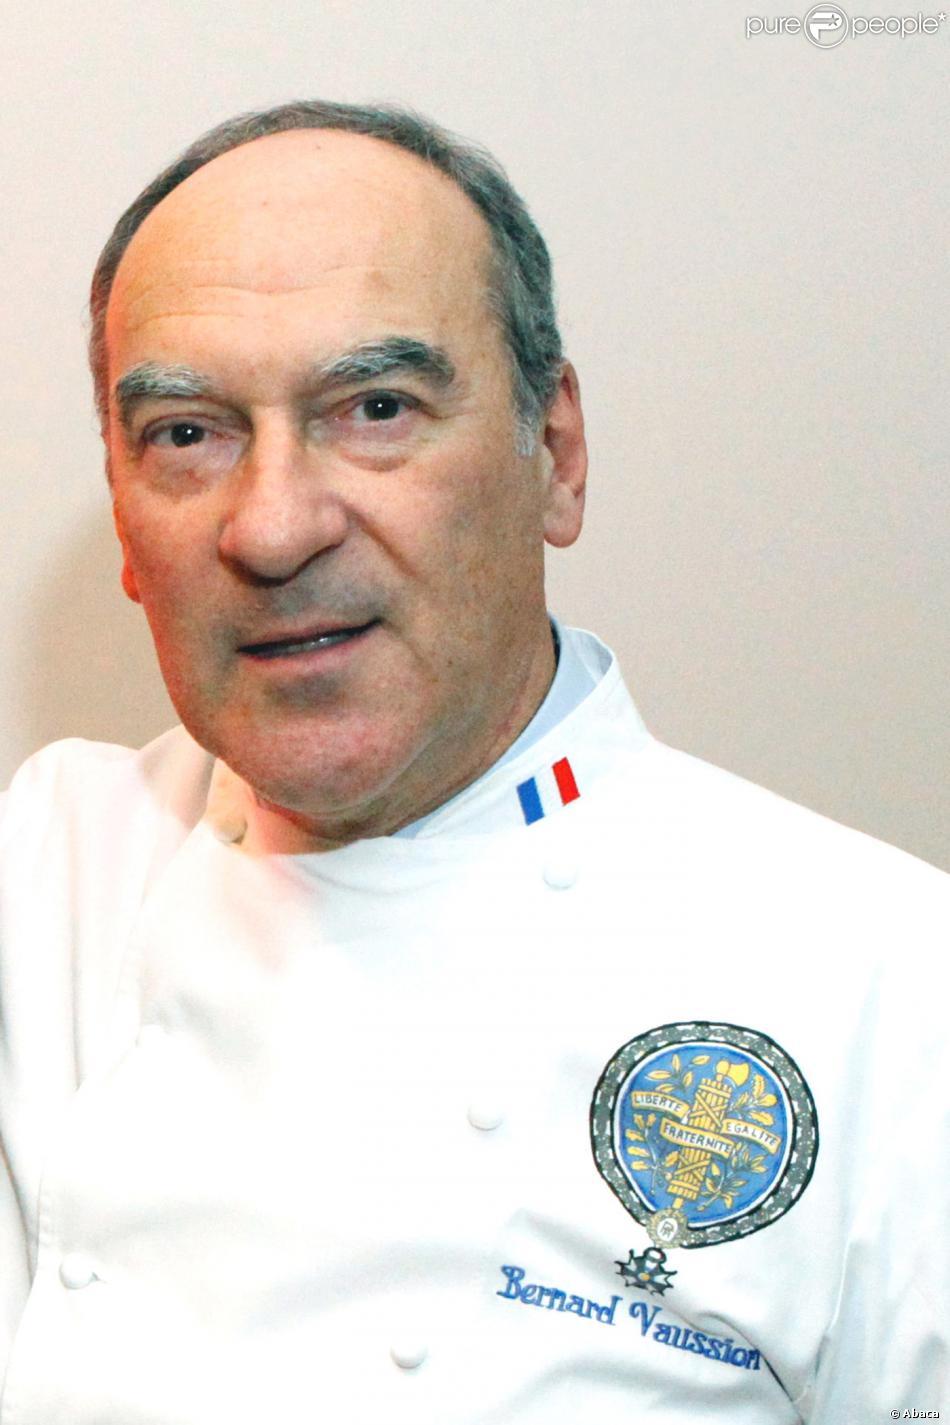 Bernard vaussion le chef quitte fran ois hollande apr s for Cuisinier elysee livre